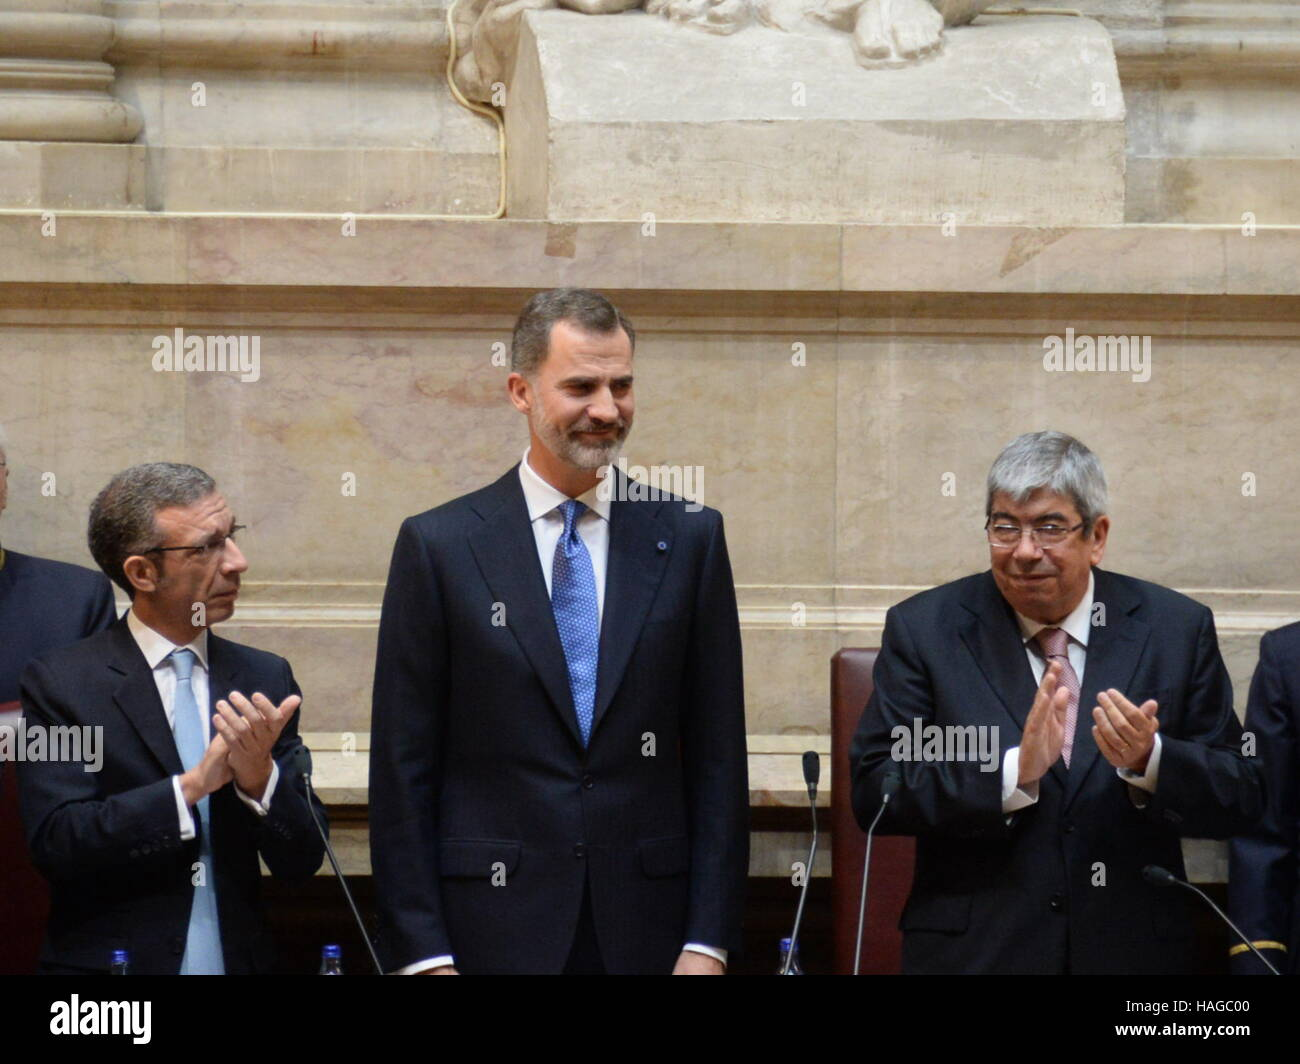 Lisbon, Portugal. 30th Nov, 2016. Spanish King Filipe VI (C) is seen at the Portuguese Parliament in Lisbon, capital - Stock Image